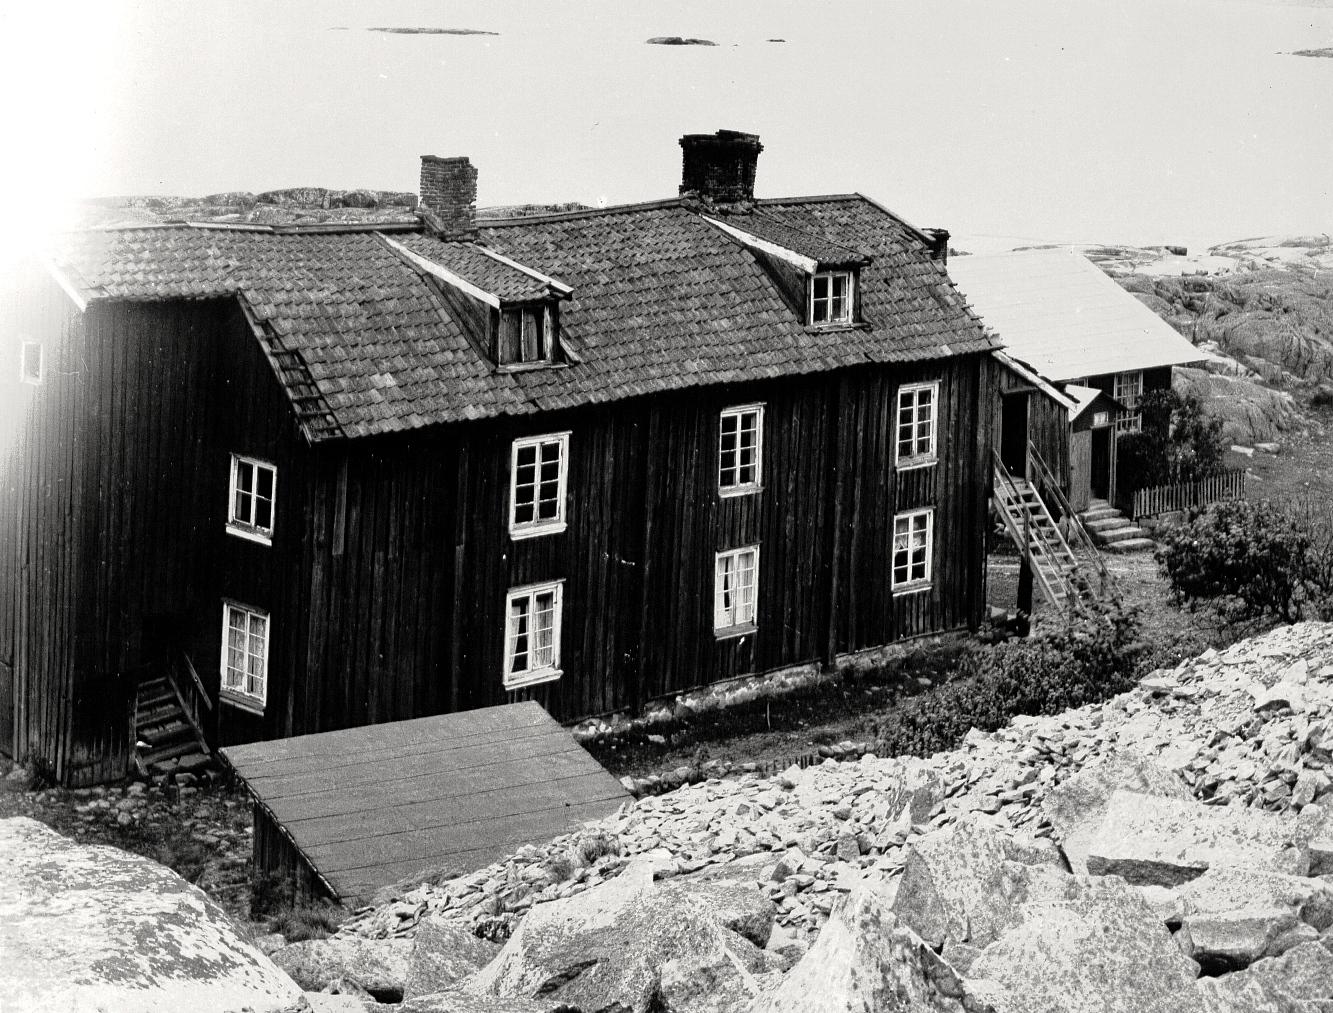 44 Hus 4 från ovan 1920 (GHM)